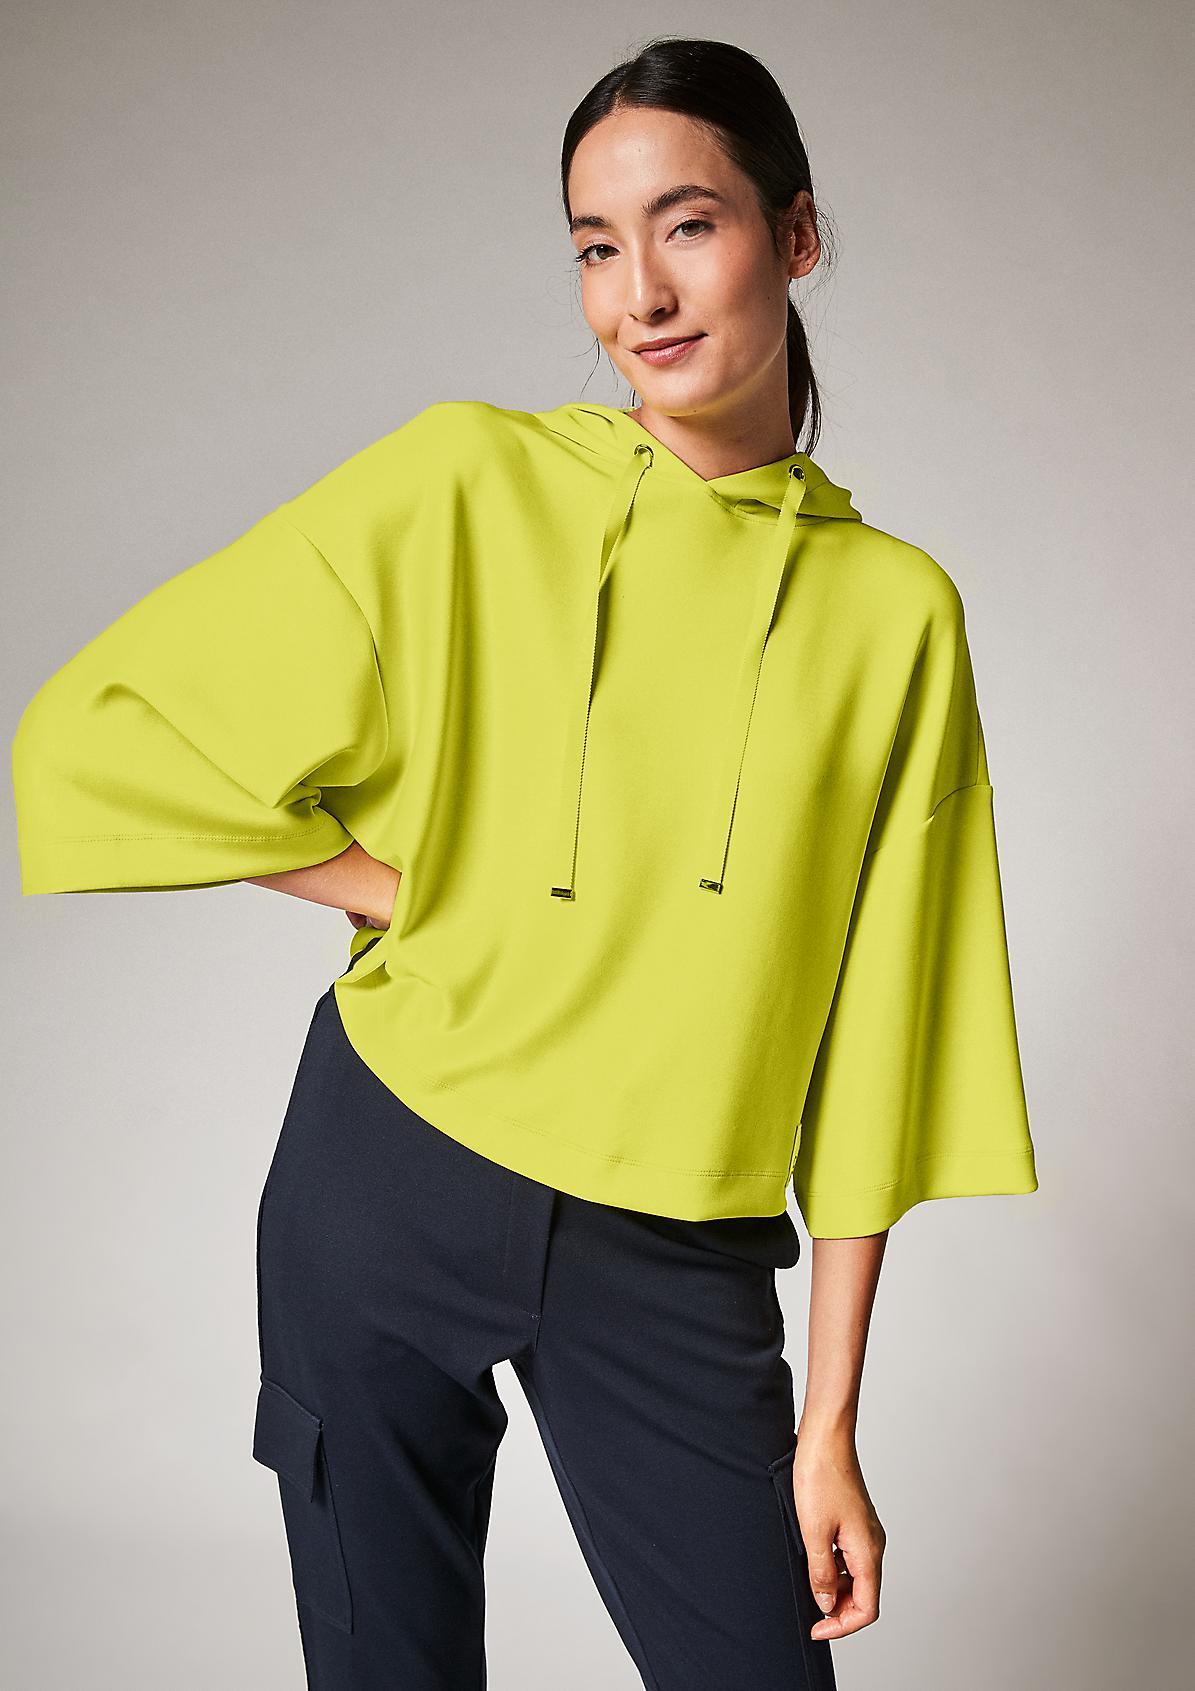 Lockeres Sweatshirt aus Scuba